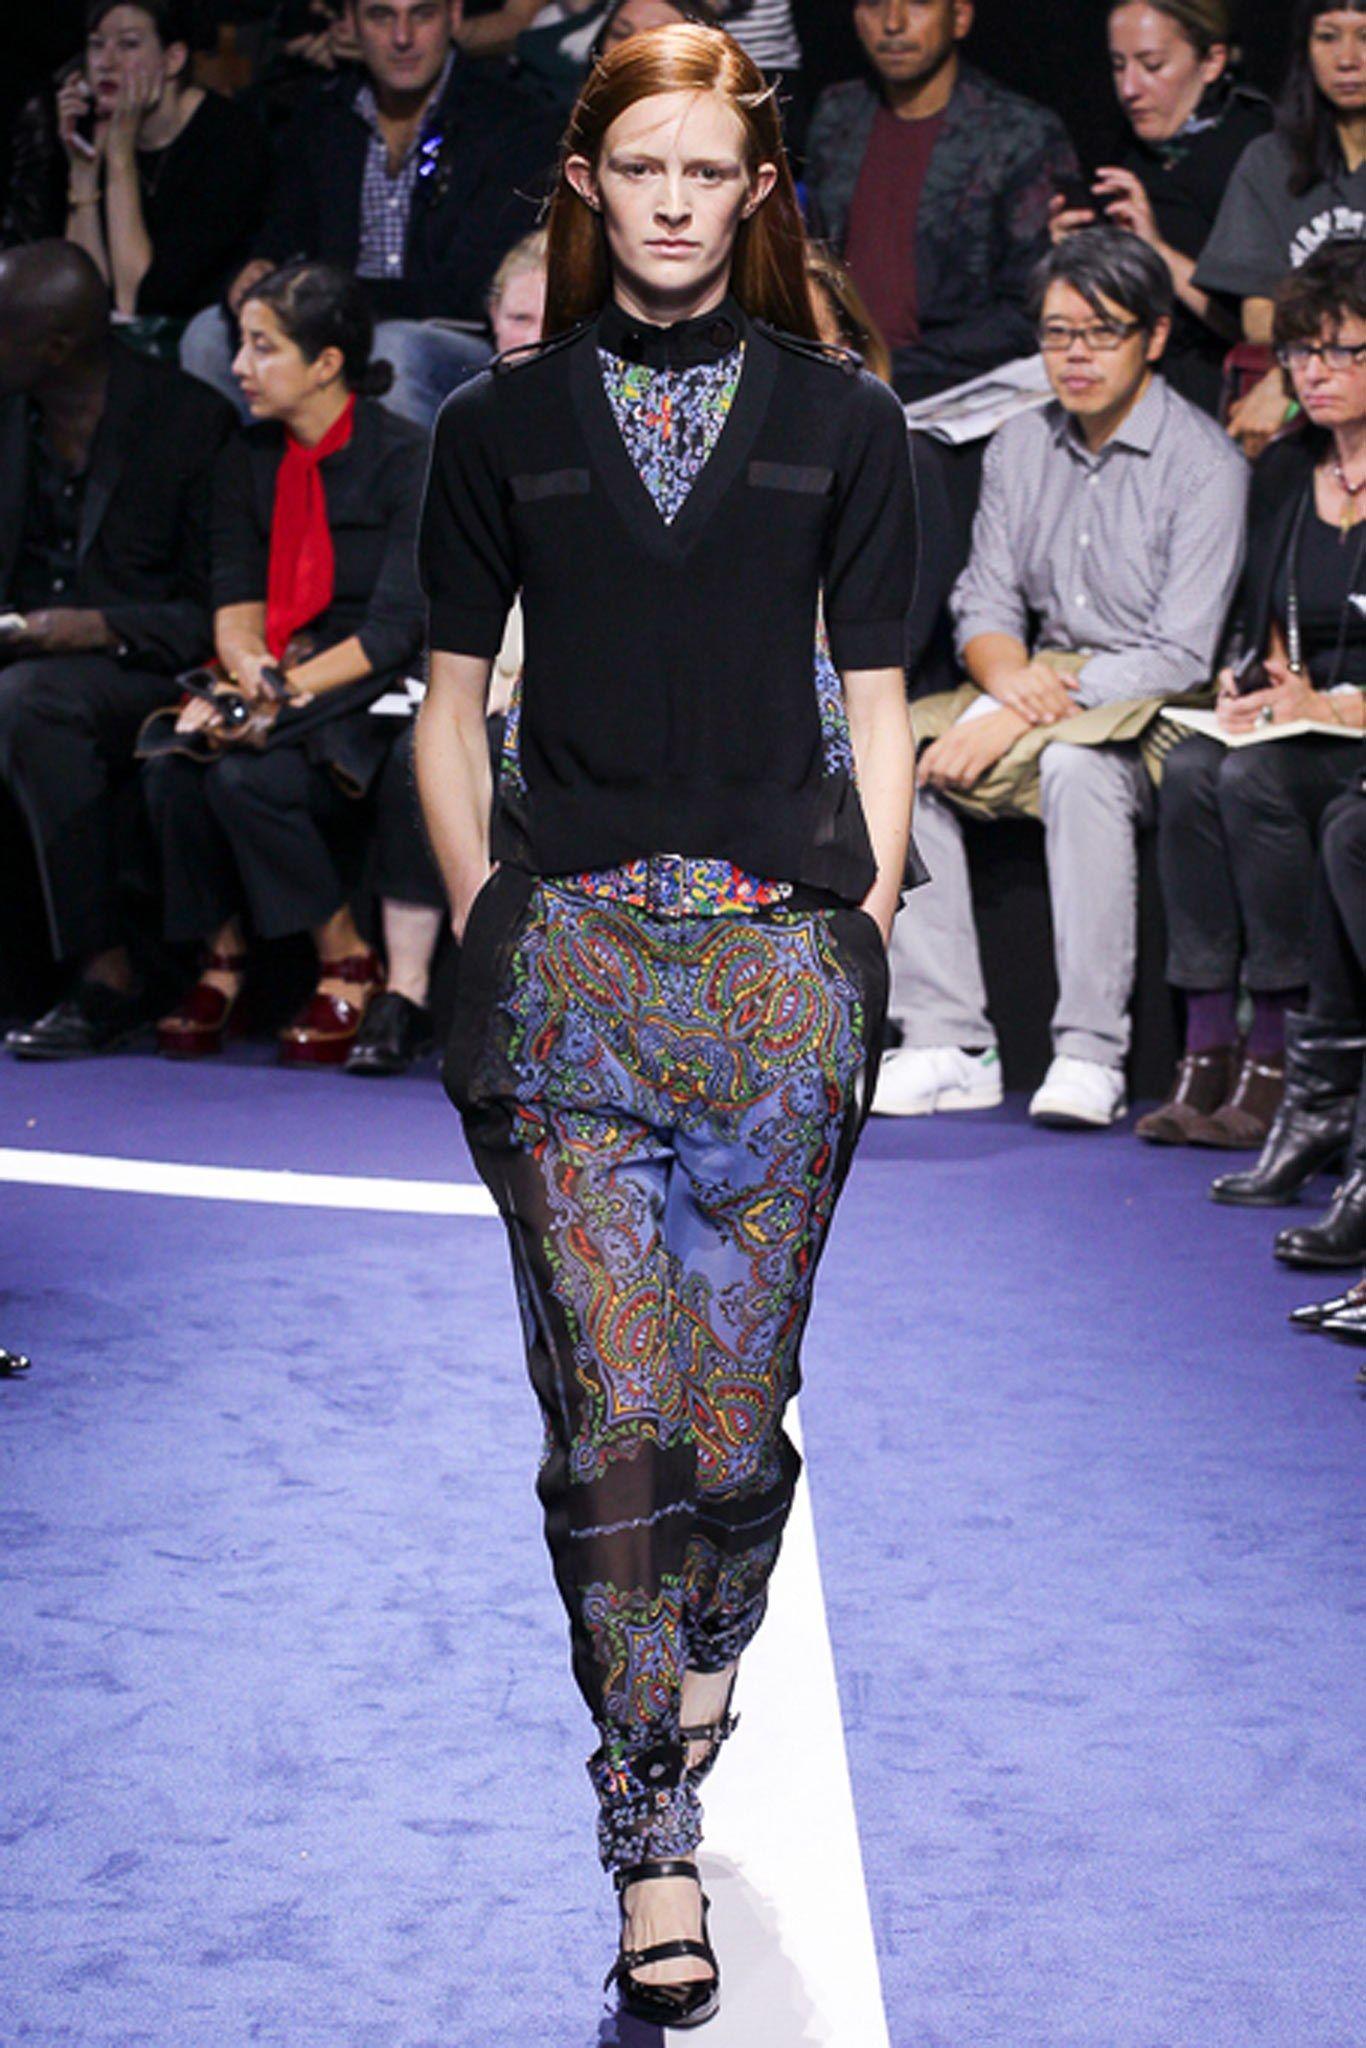 Sacai Spring 2015 Ready-to-Wear Fashion Show - Malou Høgenhaven (OUI)